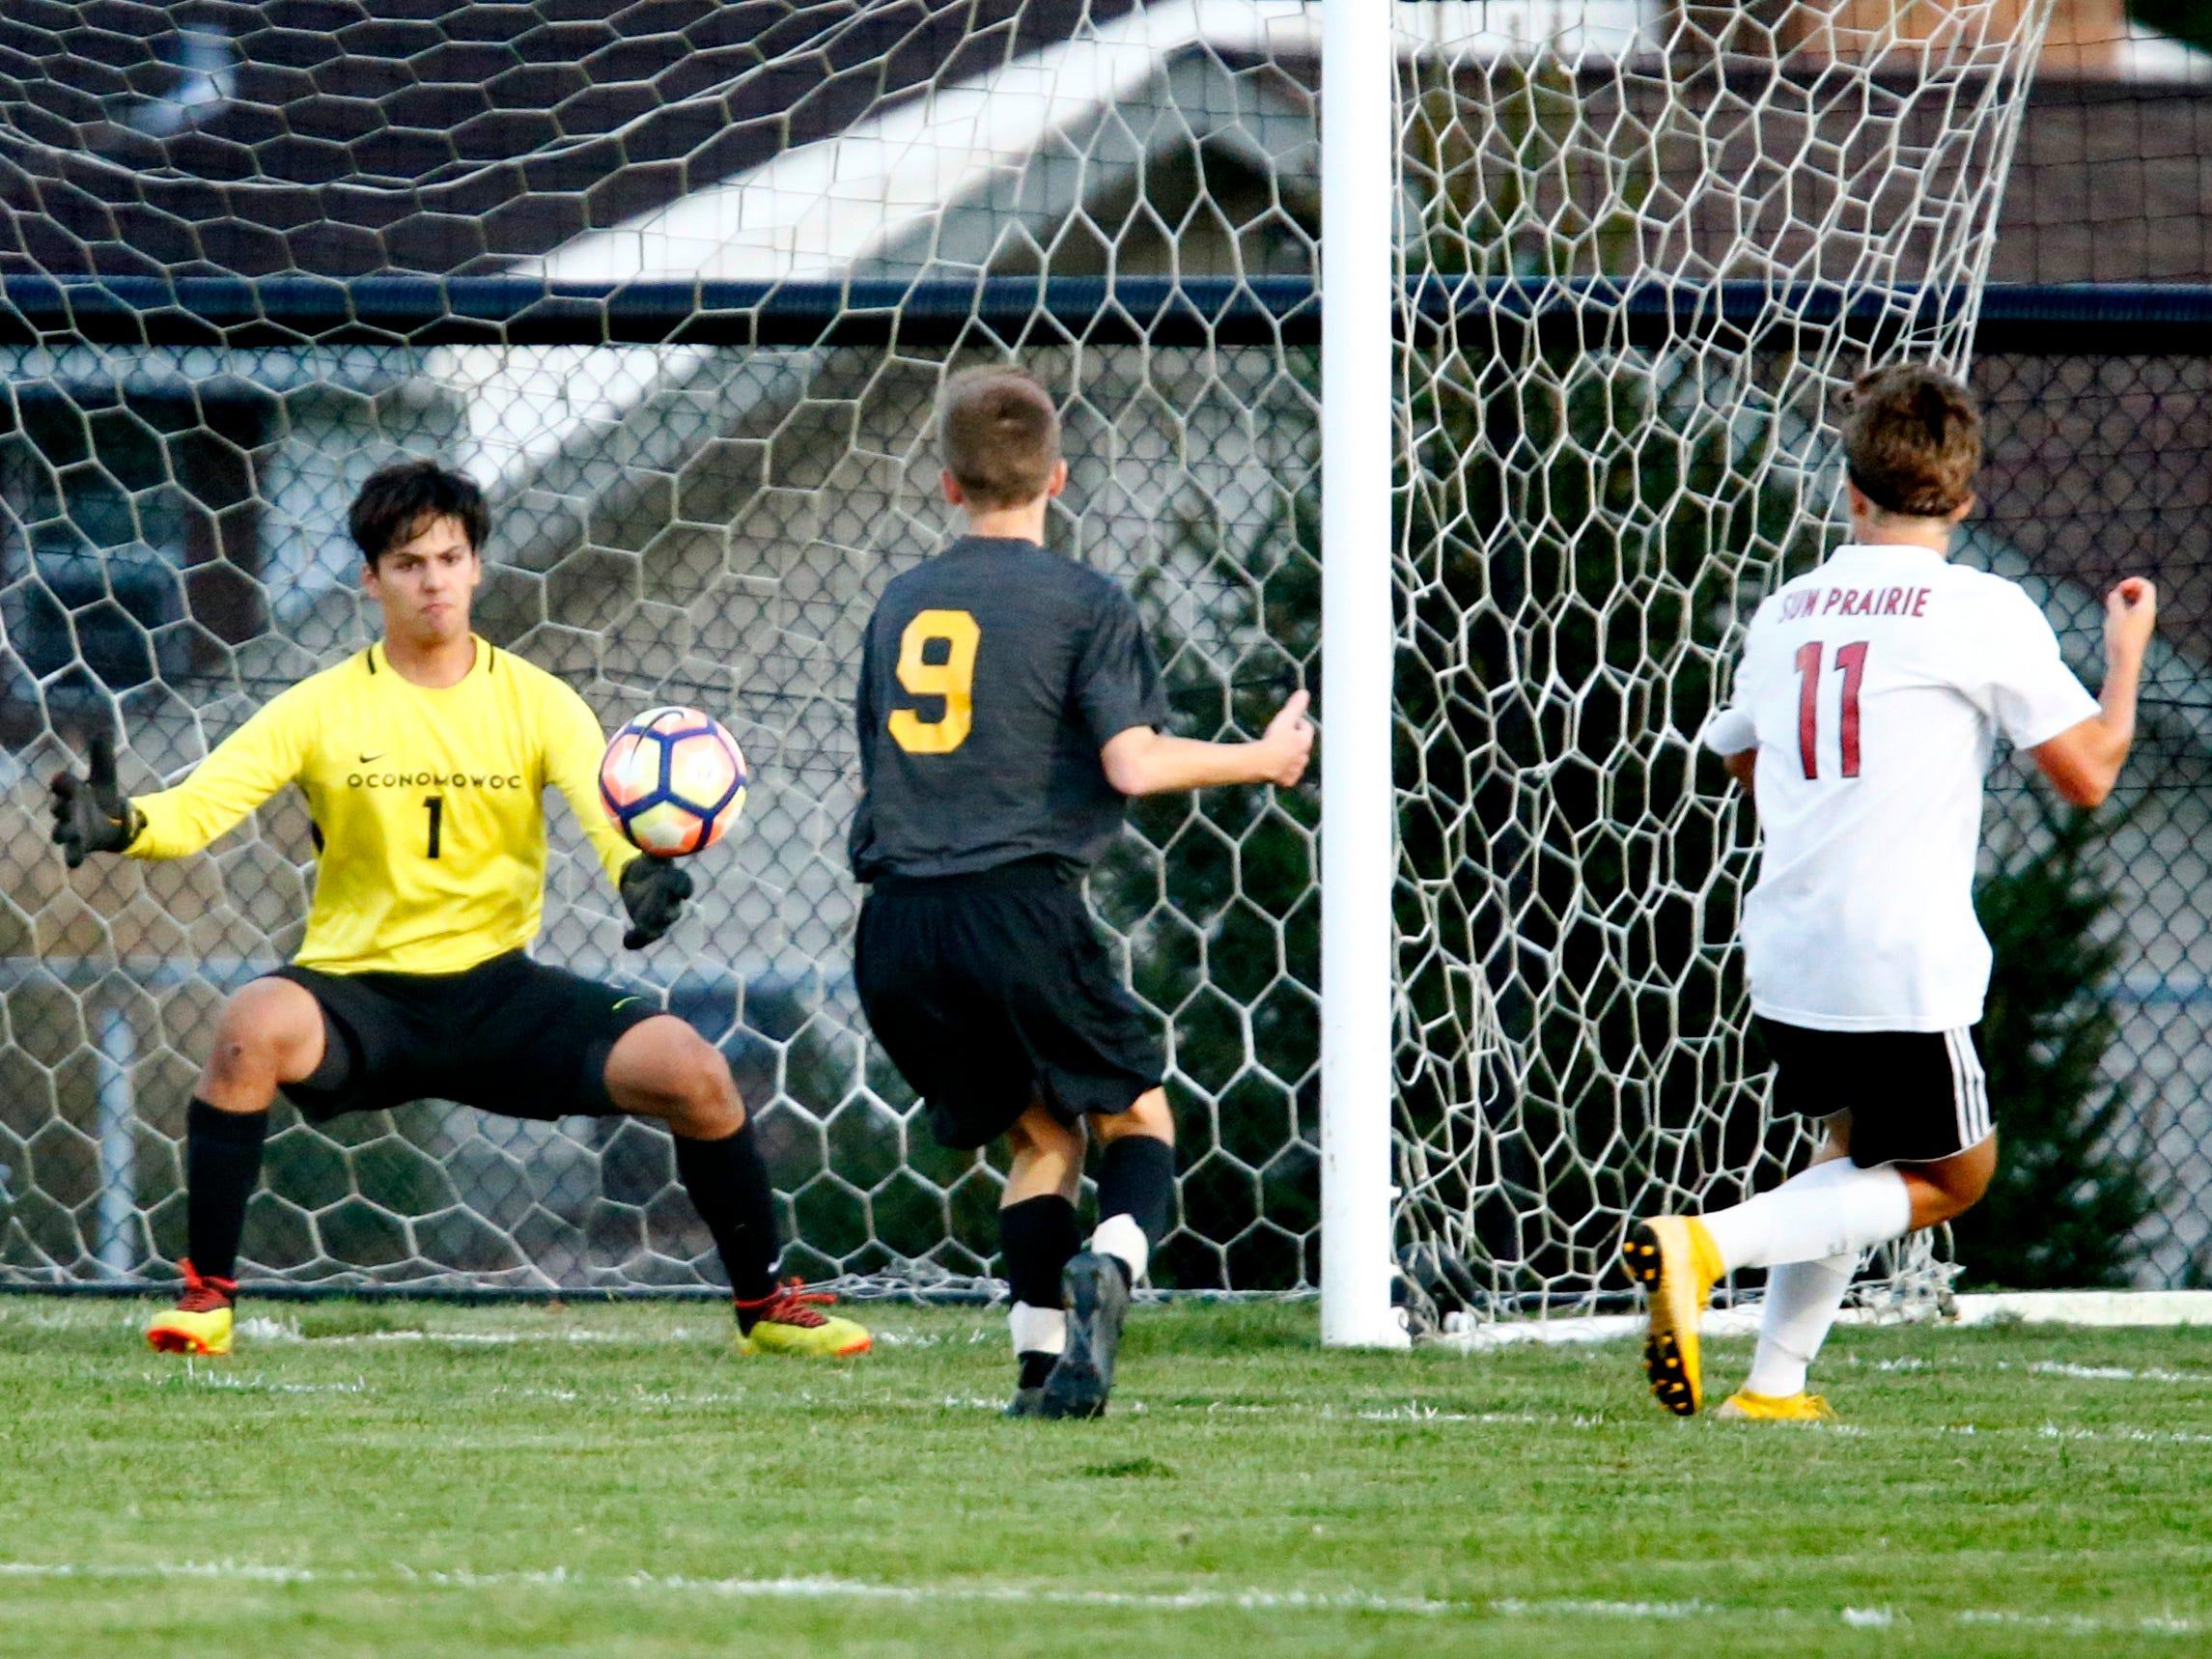 Oconomowoc's Allen Valle blocks a goal shot by Sun Prairie's Andrew Weddle at Oconomowoc on Sept. 11.